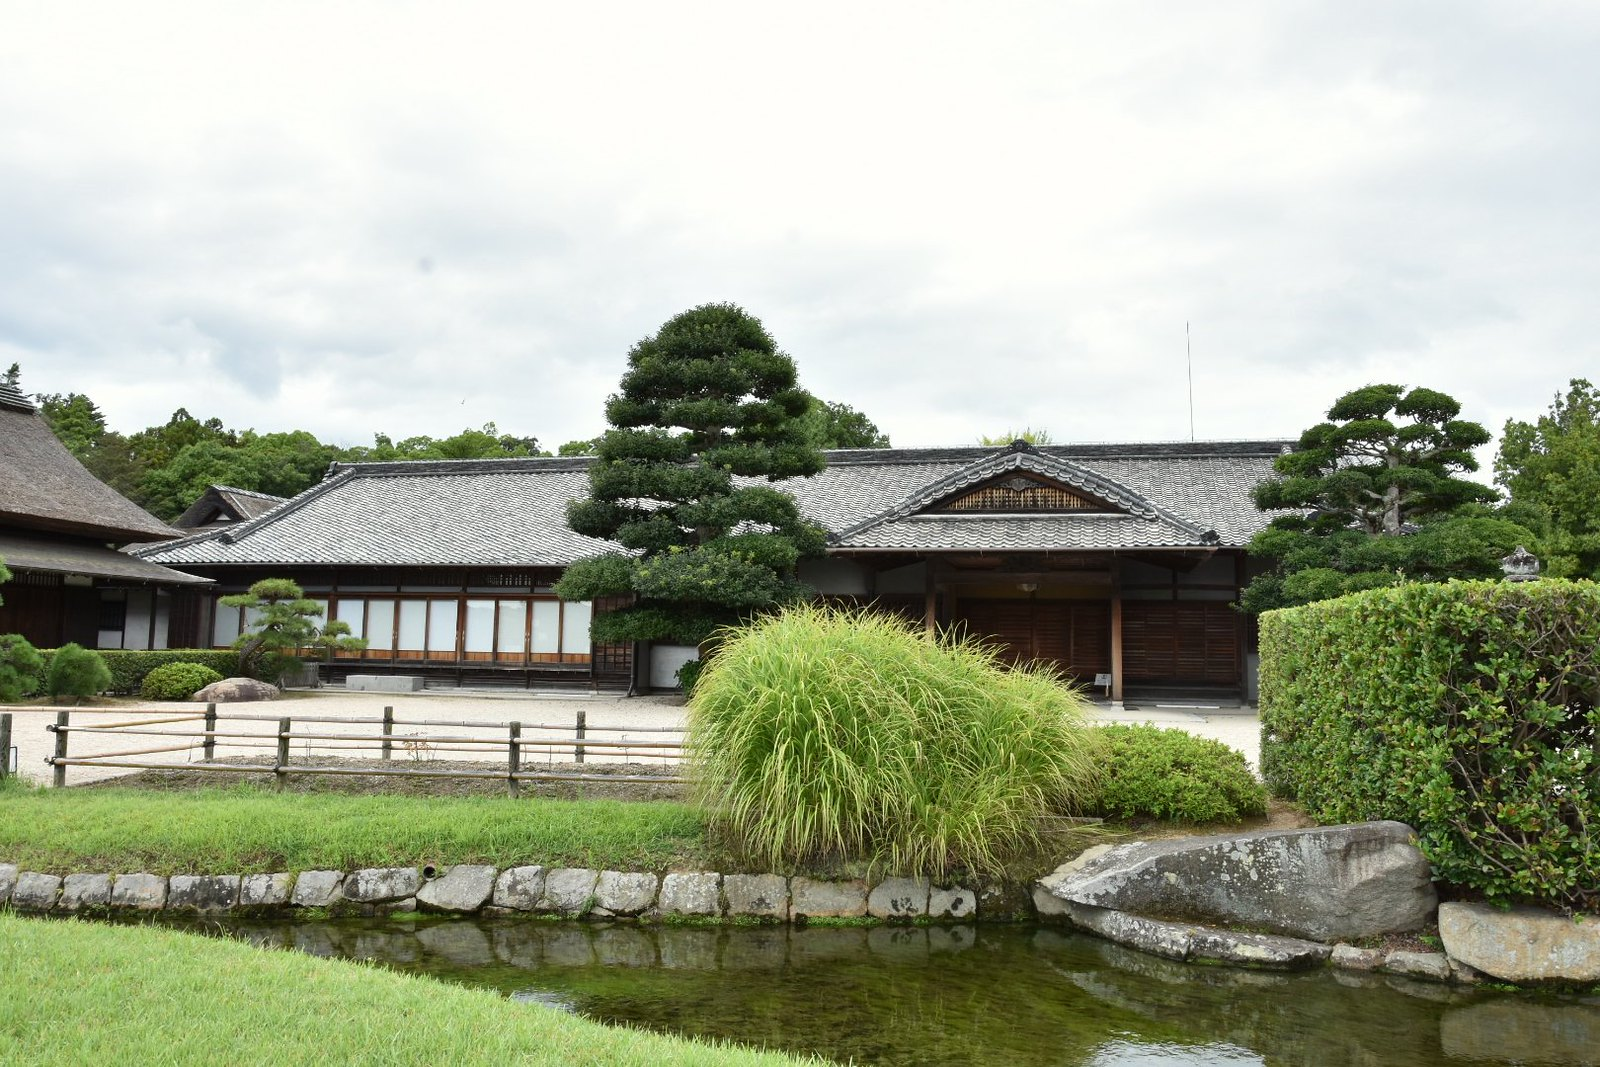 Jardins de Kôraku-en - Enyô-tei, demeure où séjournait le Daimyô